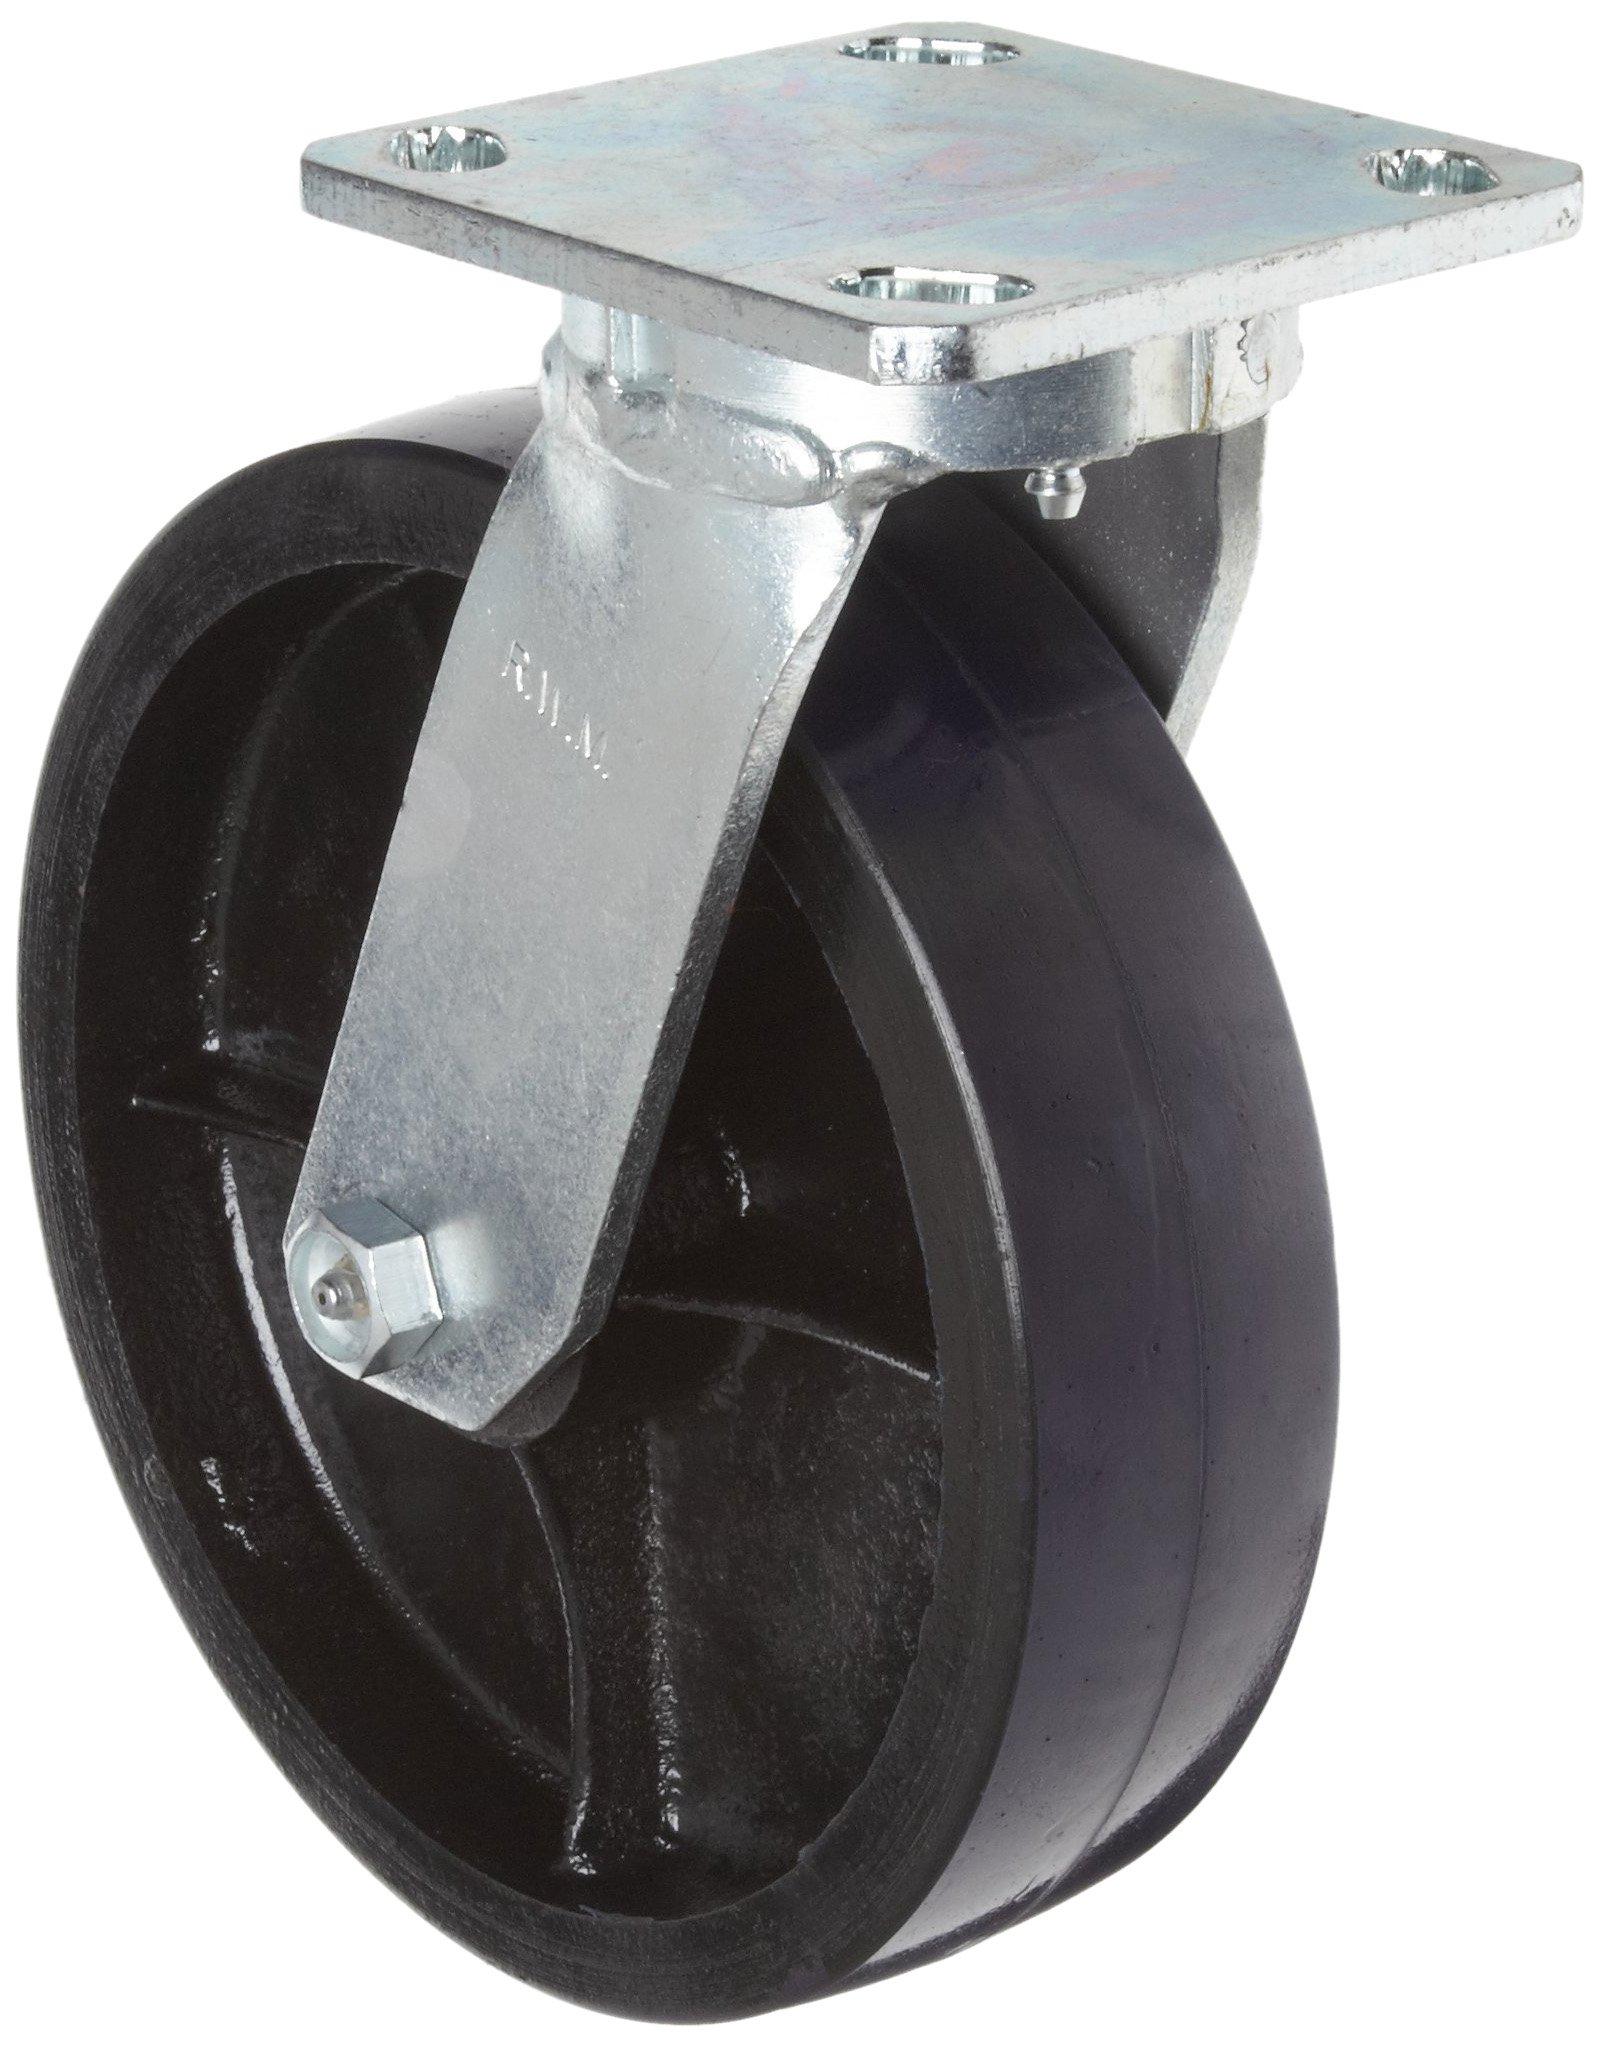 RWM Casters 65 Series Plate Caster, Swivel, Kingpinless, Urethane on Aluminum Wheel, Roller Bearing, 1500 lbs Capacity, 8'' Wheel Dia, 2'' Wheel Width, 10-1/8'' Mount Height, 4-1/2'' Plate Length, 4'' Plate Width